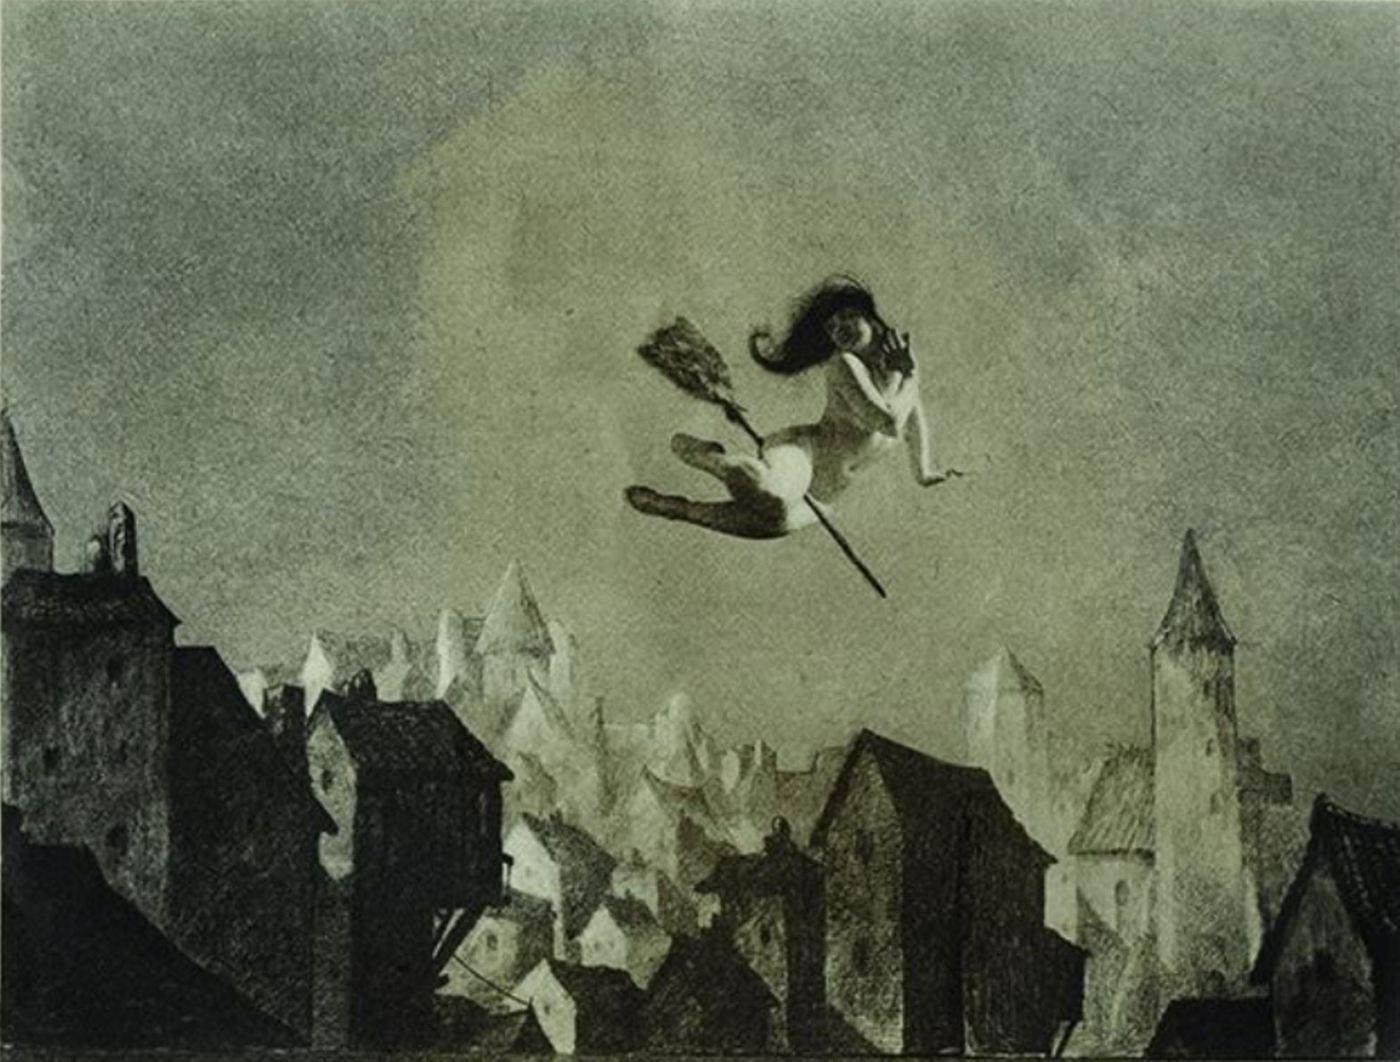 william-mortensen-off-for-the-sabbot-1927-via-vice-com.jpg